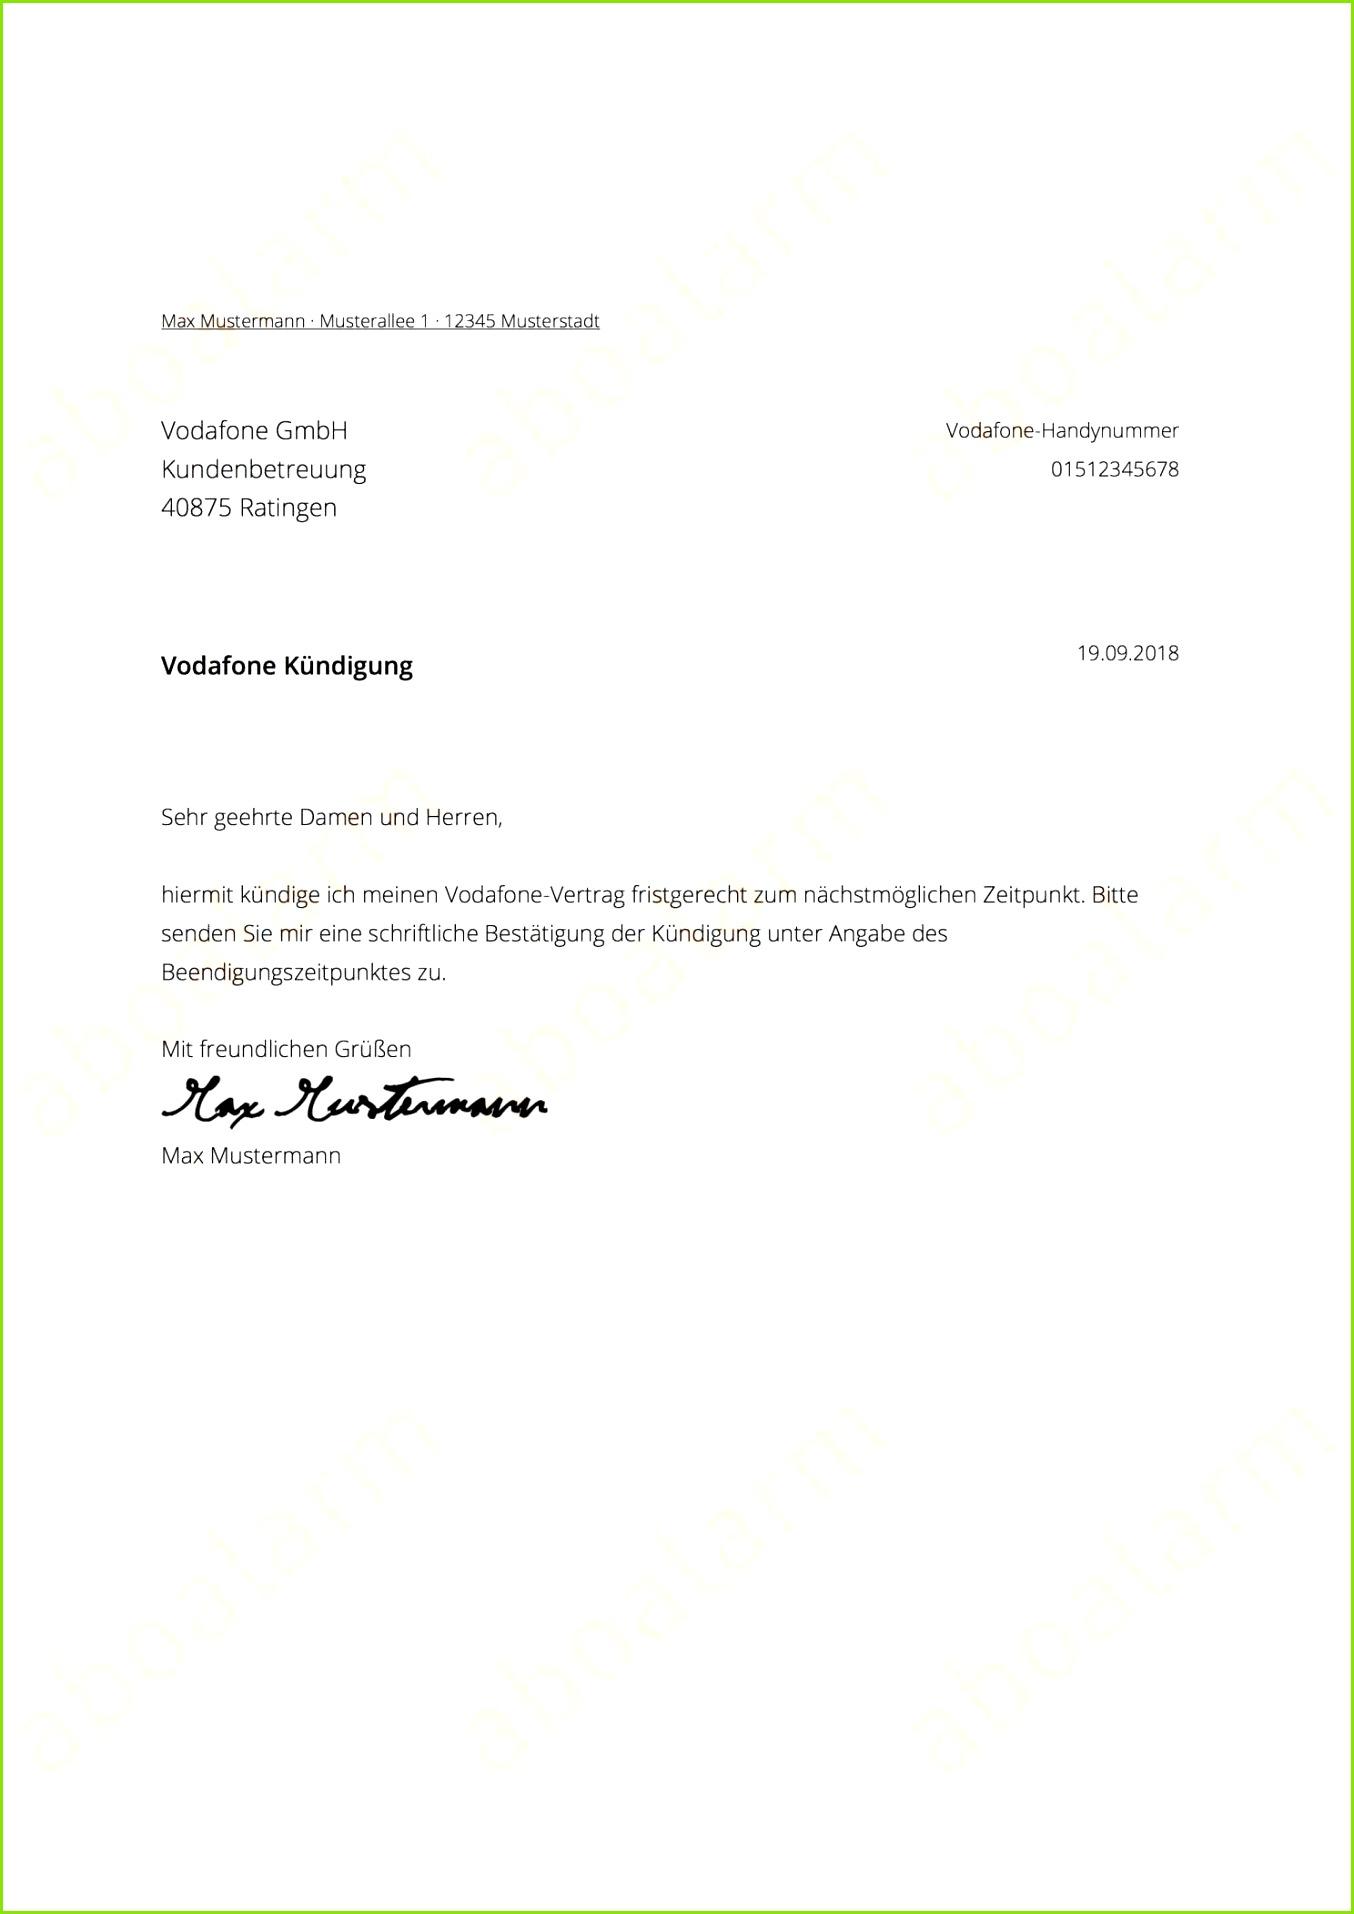 vodafone handyvertrag direkt ✅online kündigen & Vodafone Handyvertrag Kundigen Muster